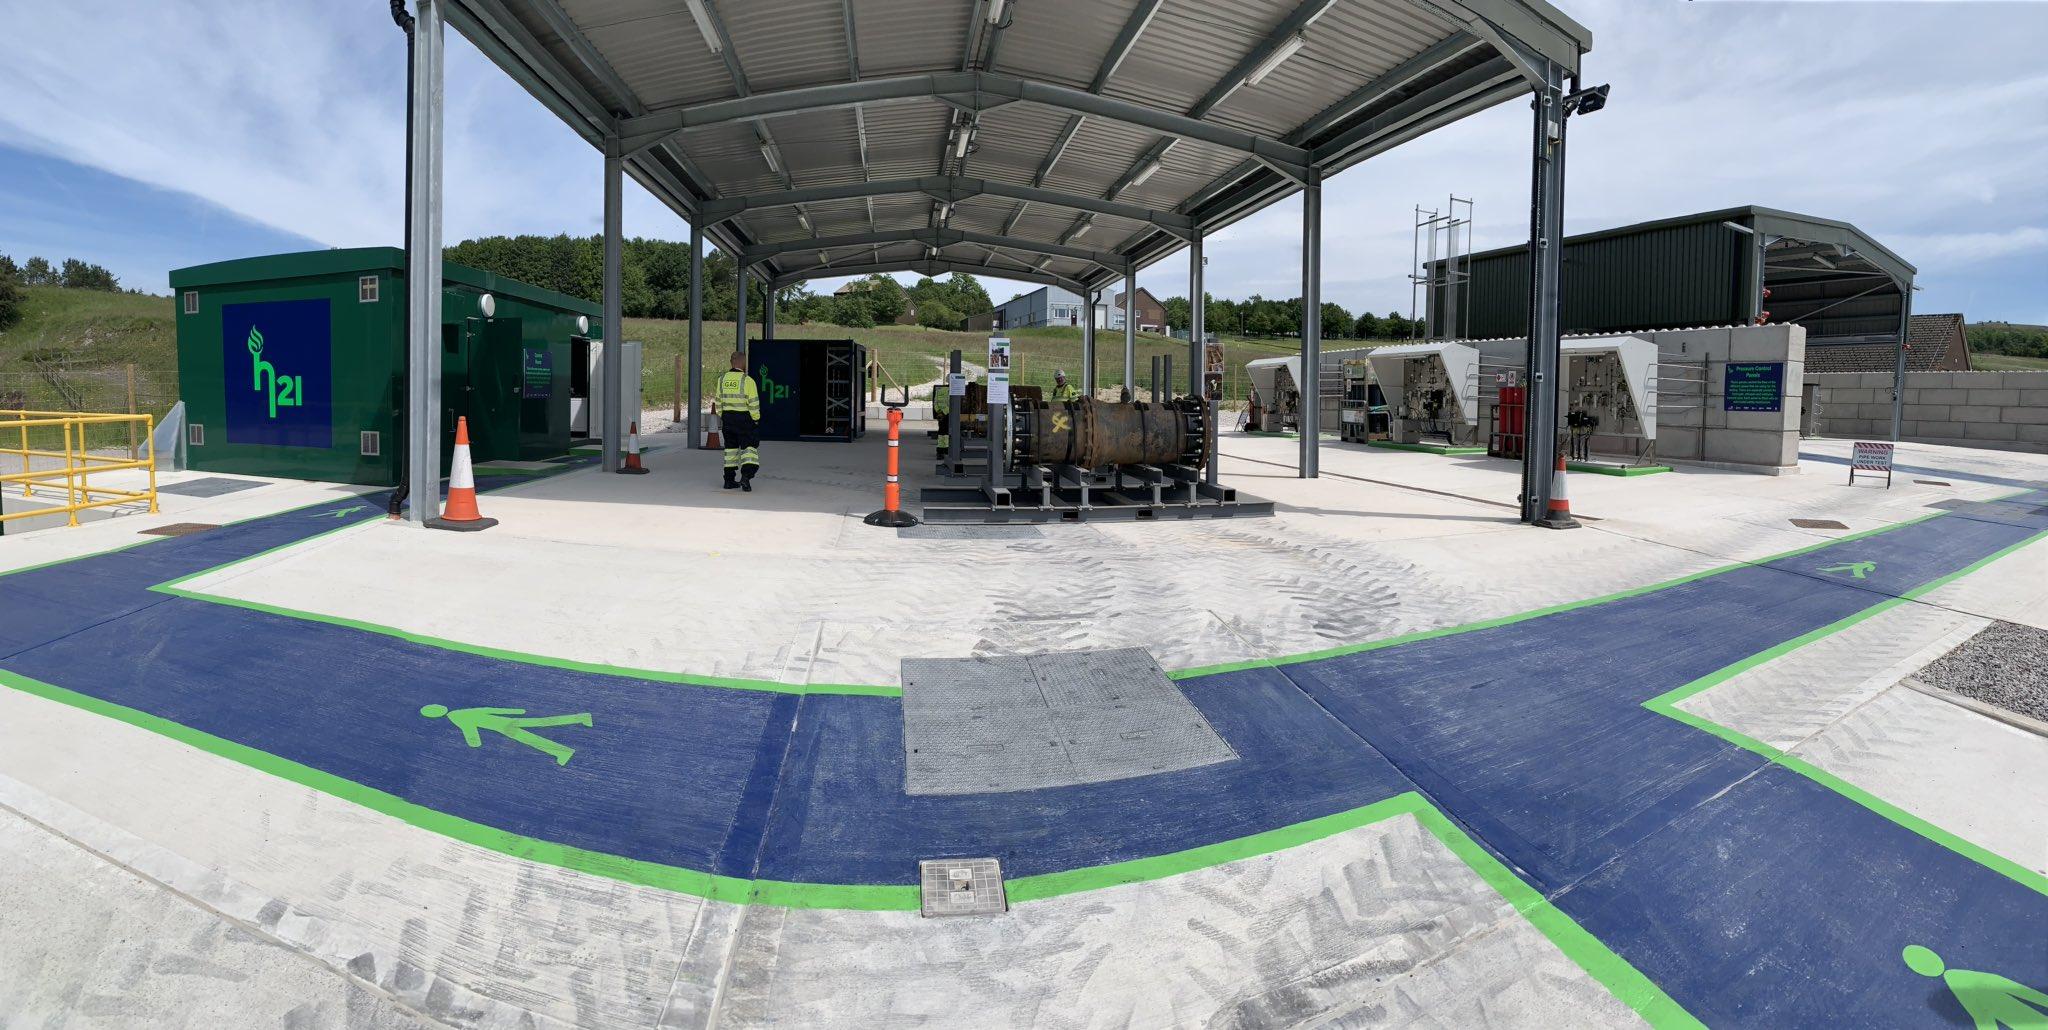 H21 Testing Center Opens main